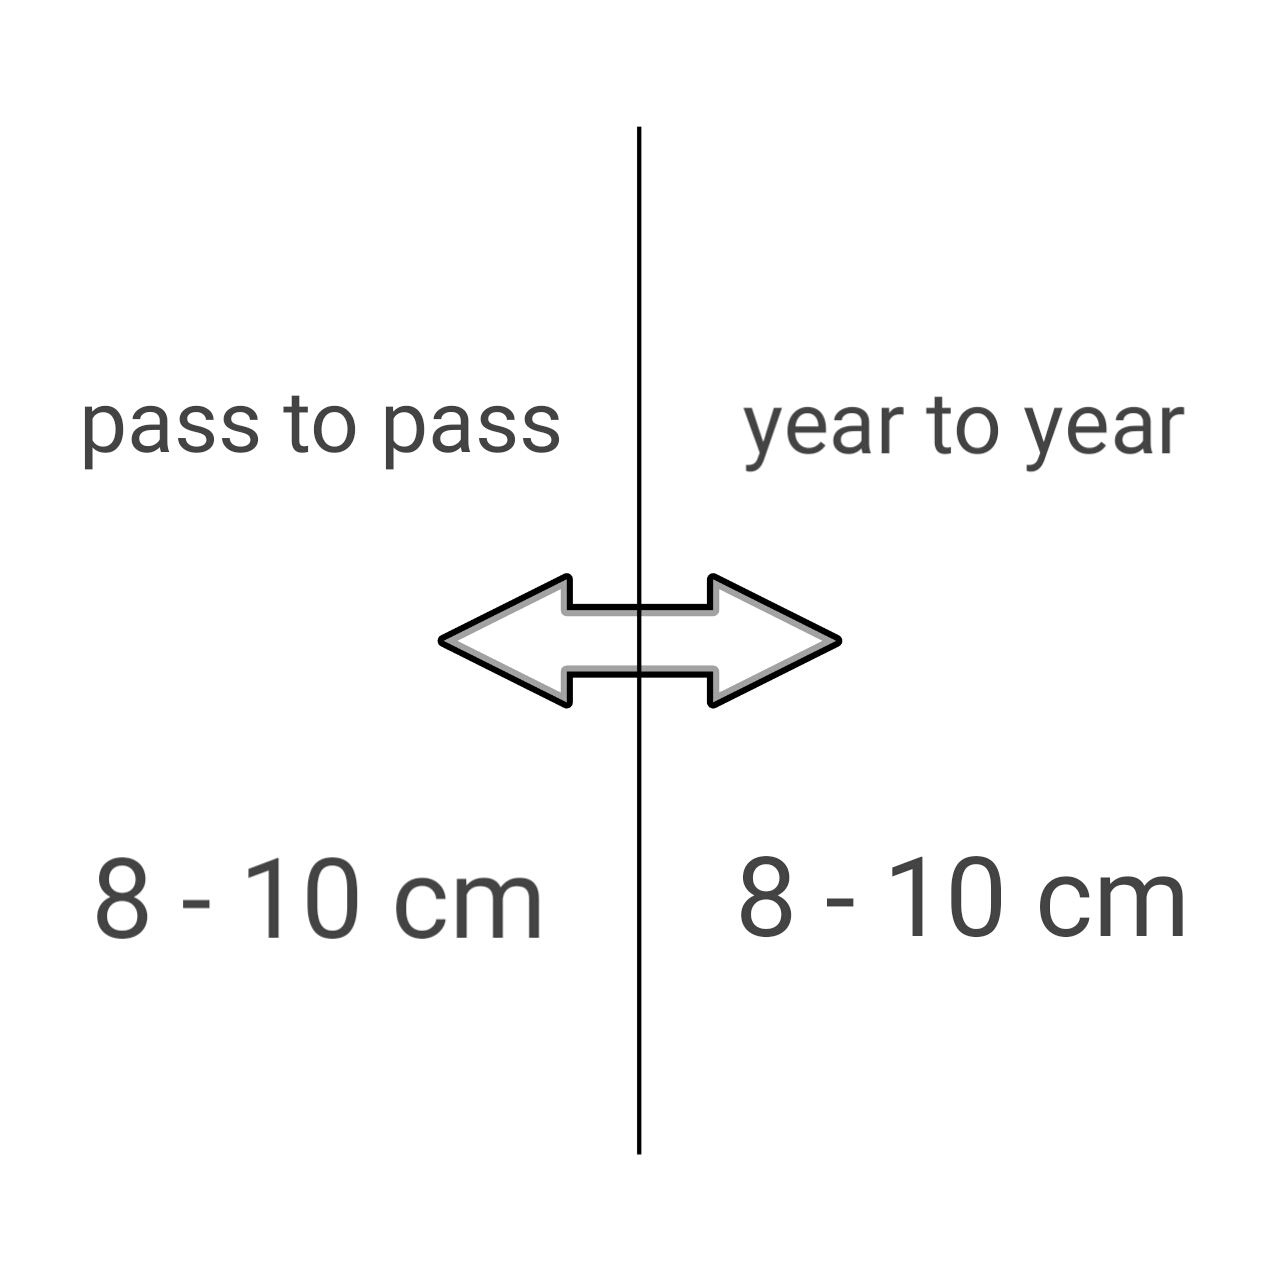 OmniSTAR G2 & OmniSTAR XP 8 – 10 cm Korrektursignal